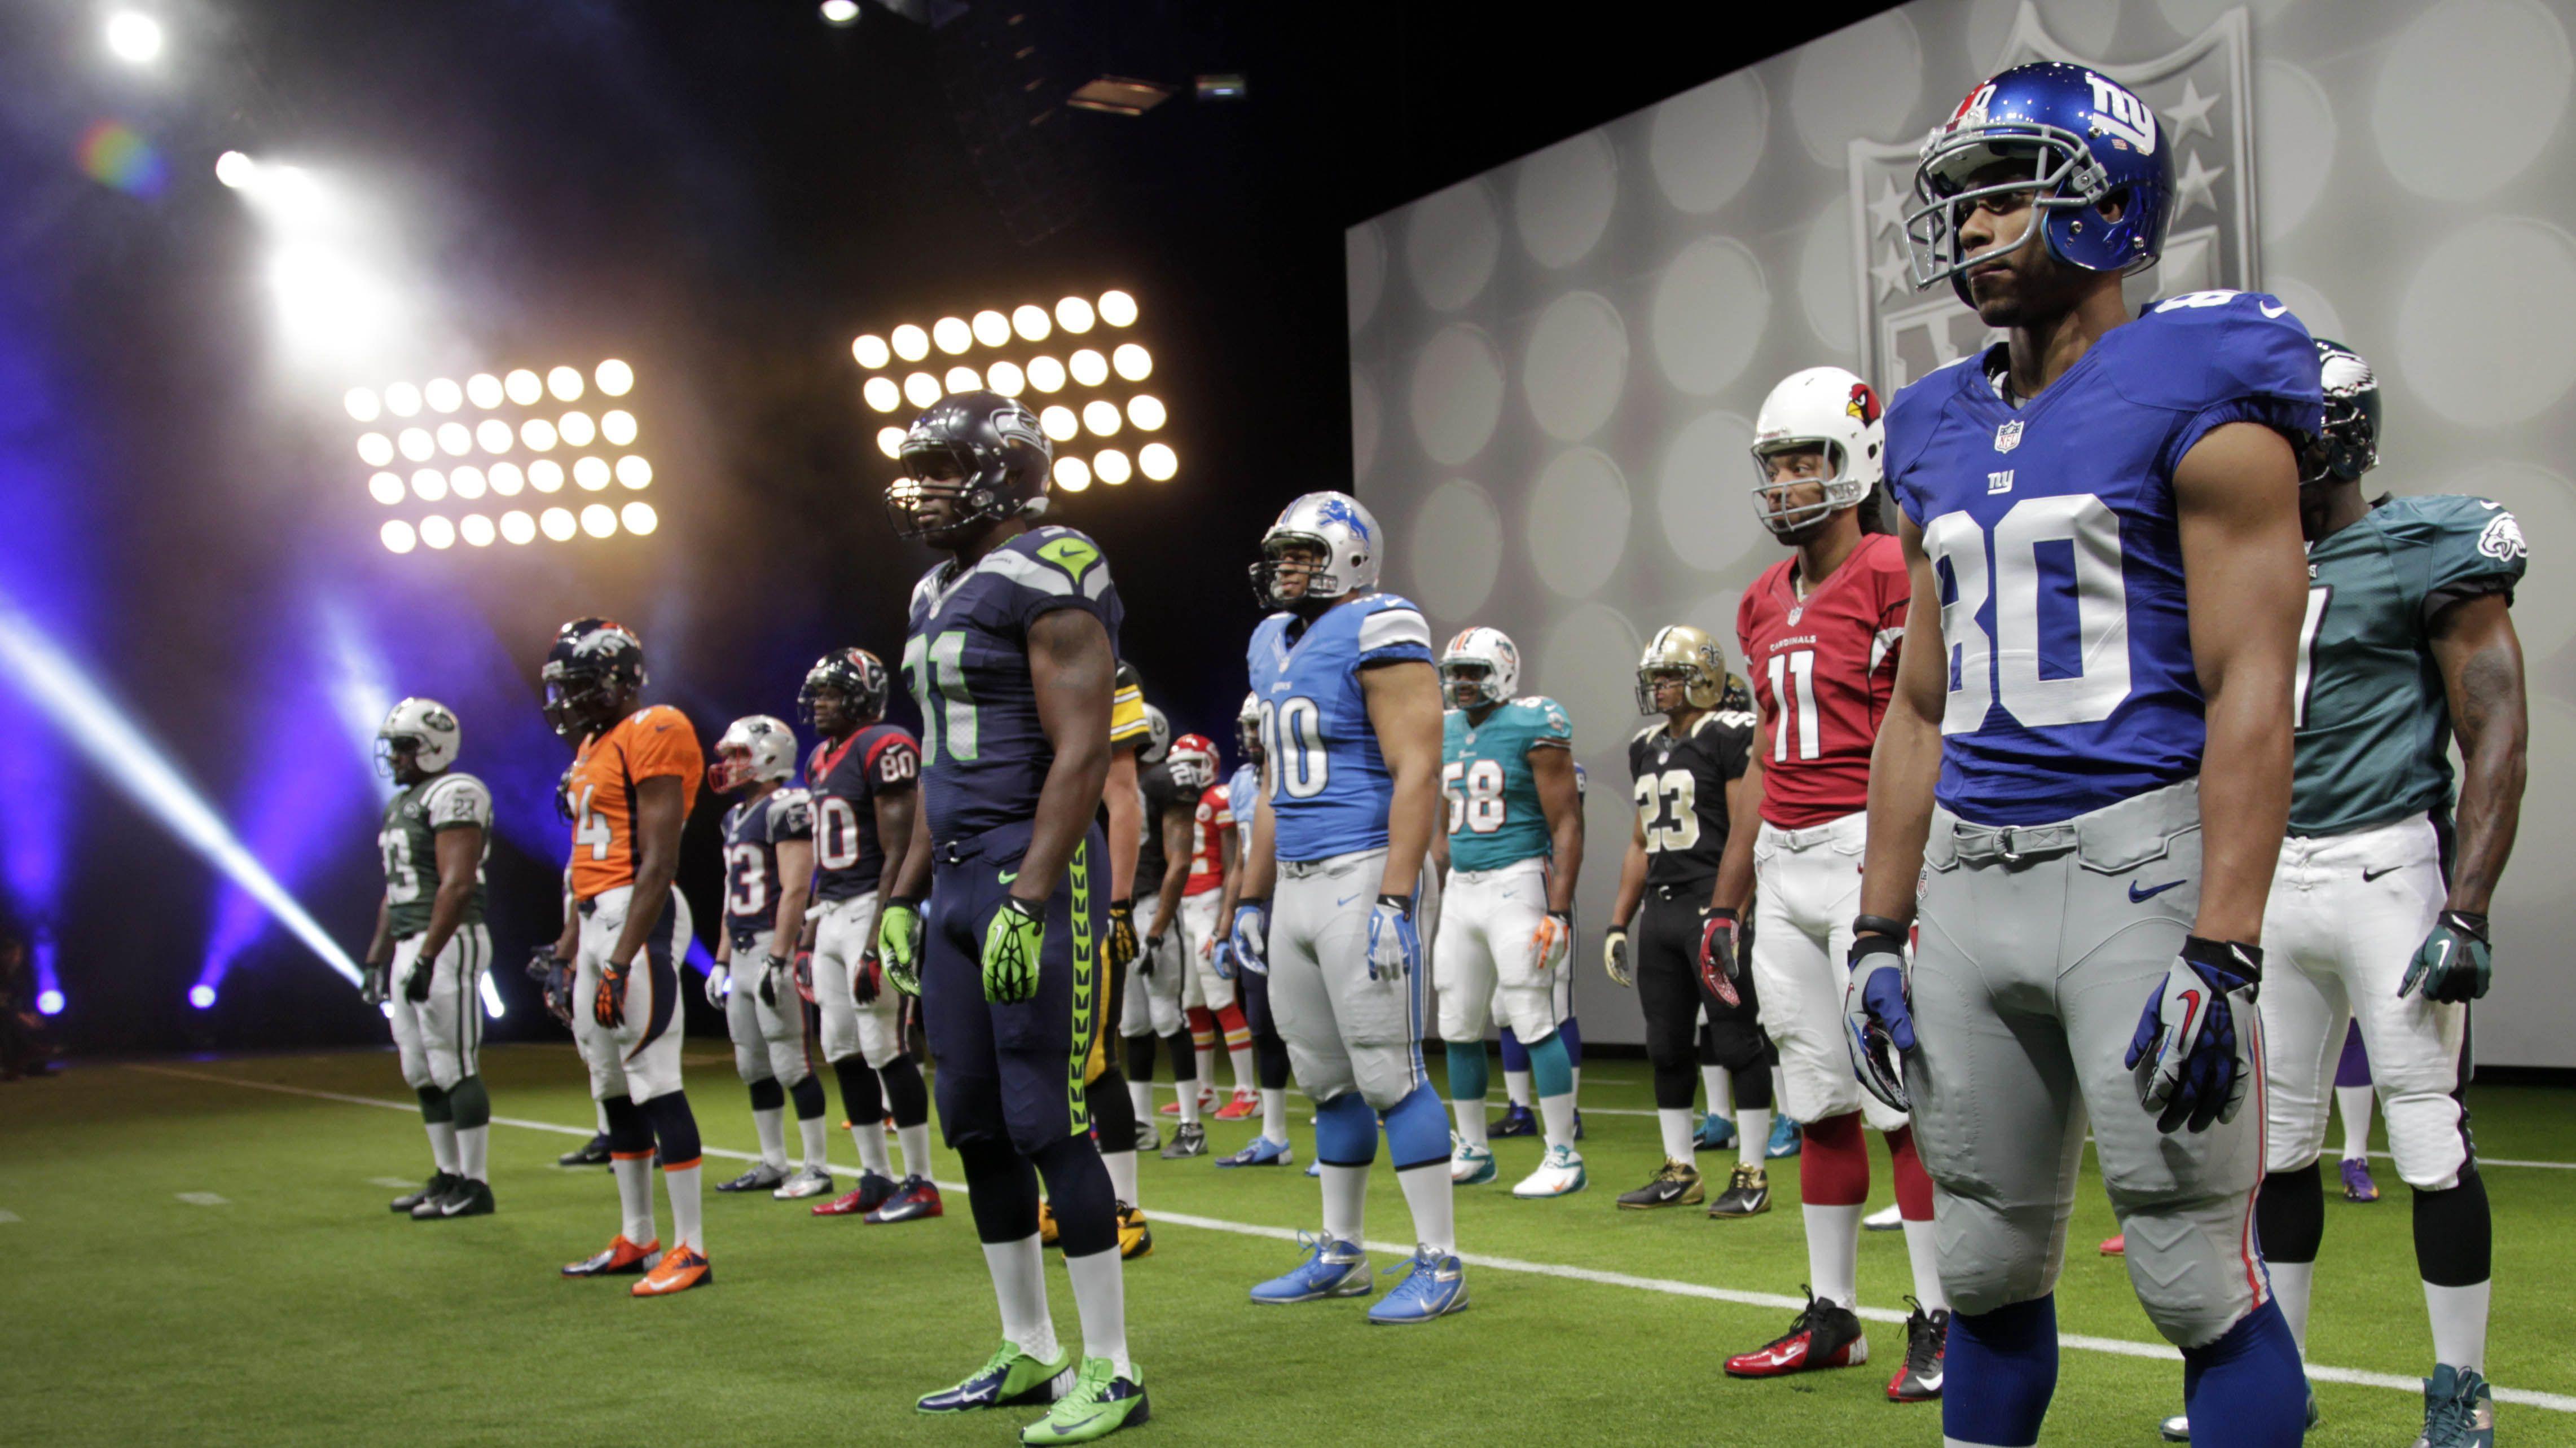 футбол 1 Wallpaper: NFL Wallpapers For Desktop HD Images NFL Collection